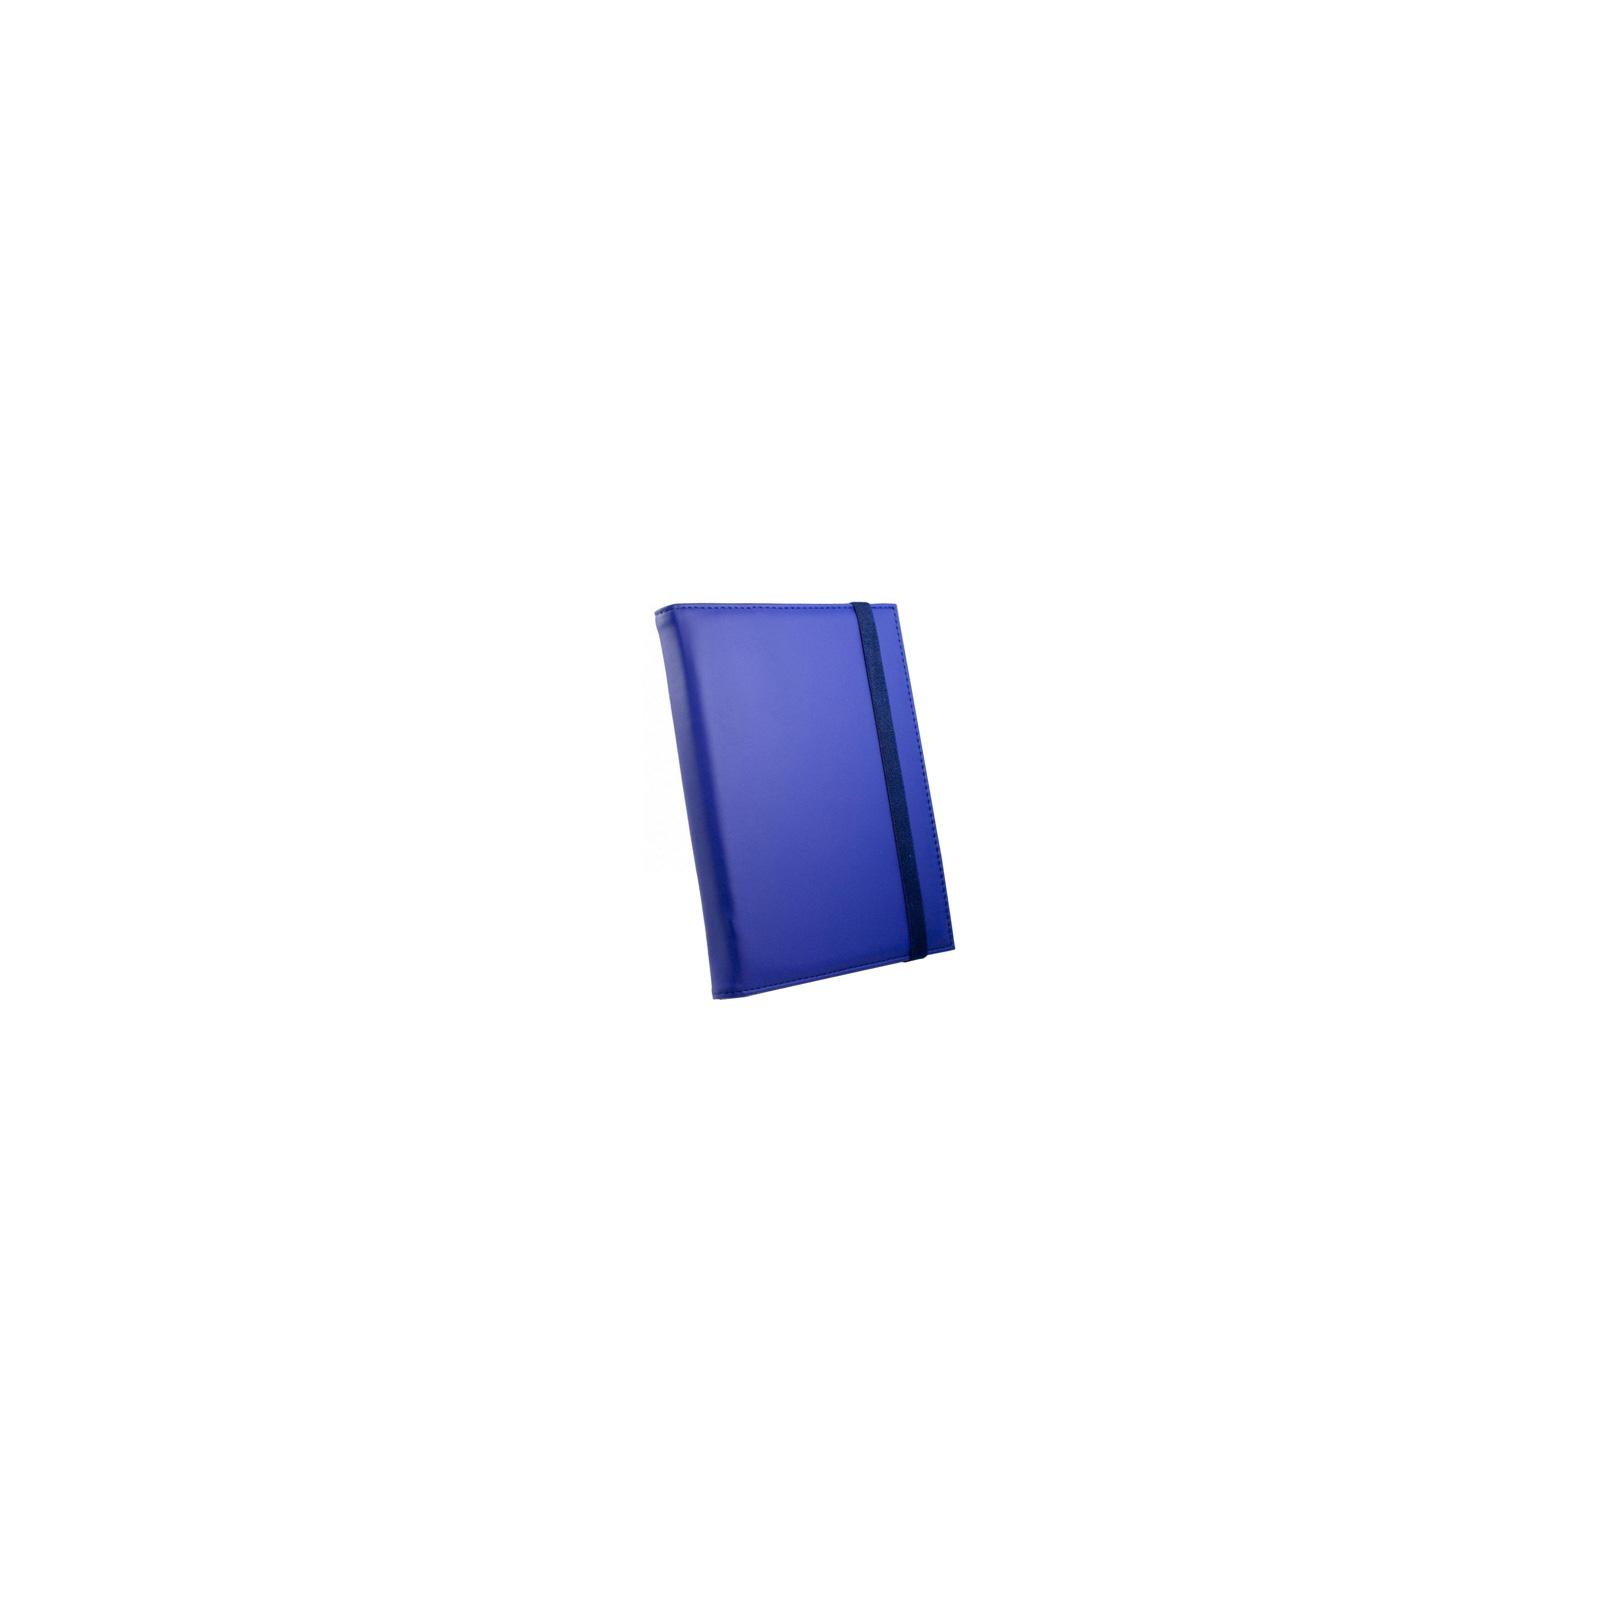 Чехол для электронной книги Tuff-Luv 6 Slim Book Sonic Blue (A12_4)